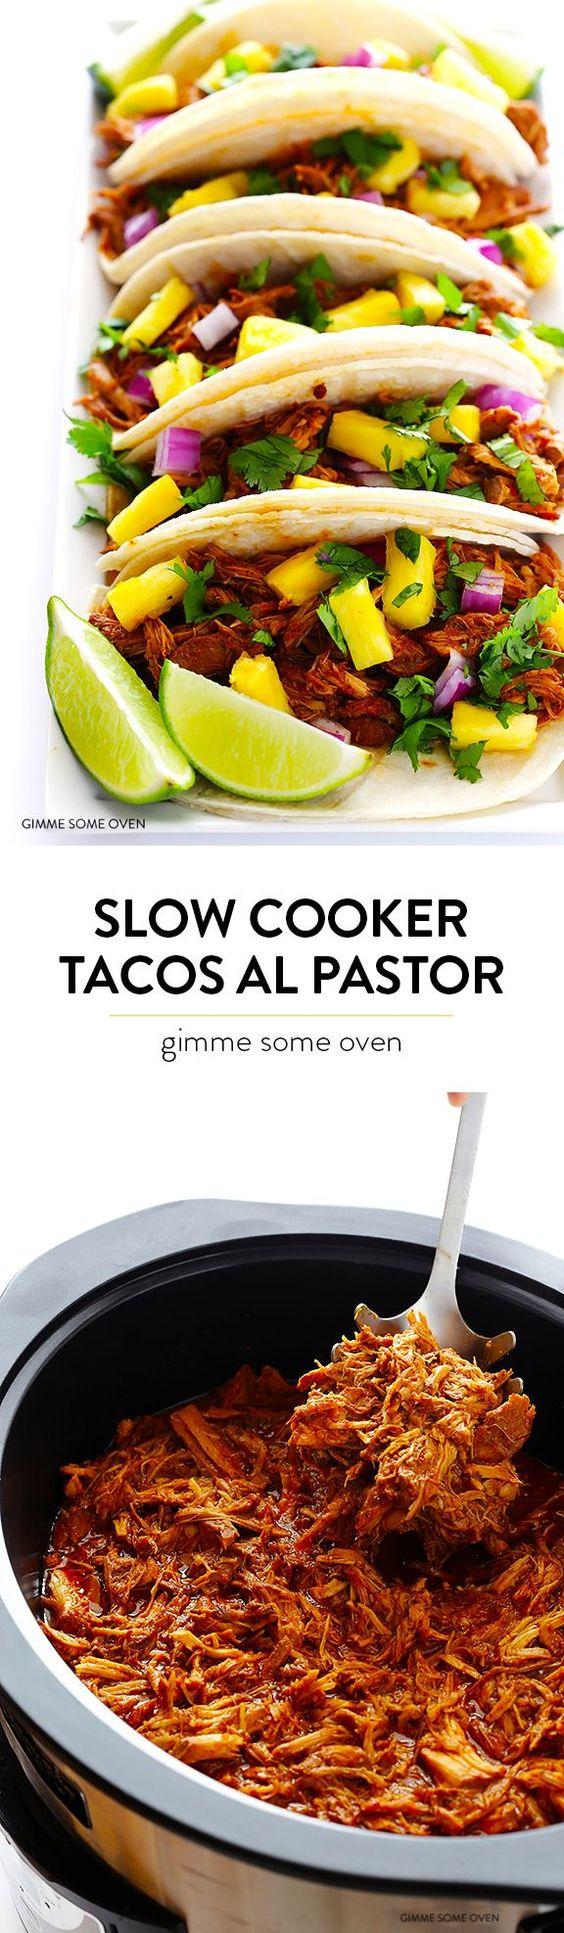 Slow Cooker Tacos Al Pastor   Recipe   Slow Cooker Tacos, Al Pastor ...